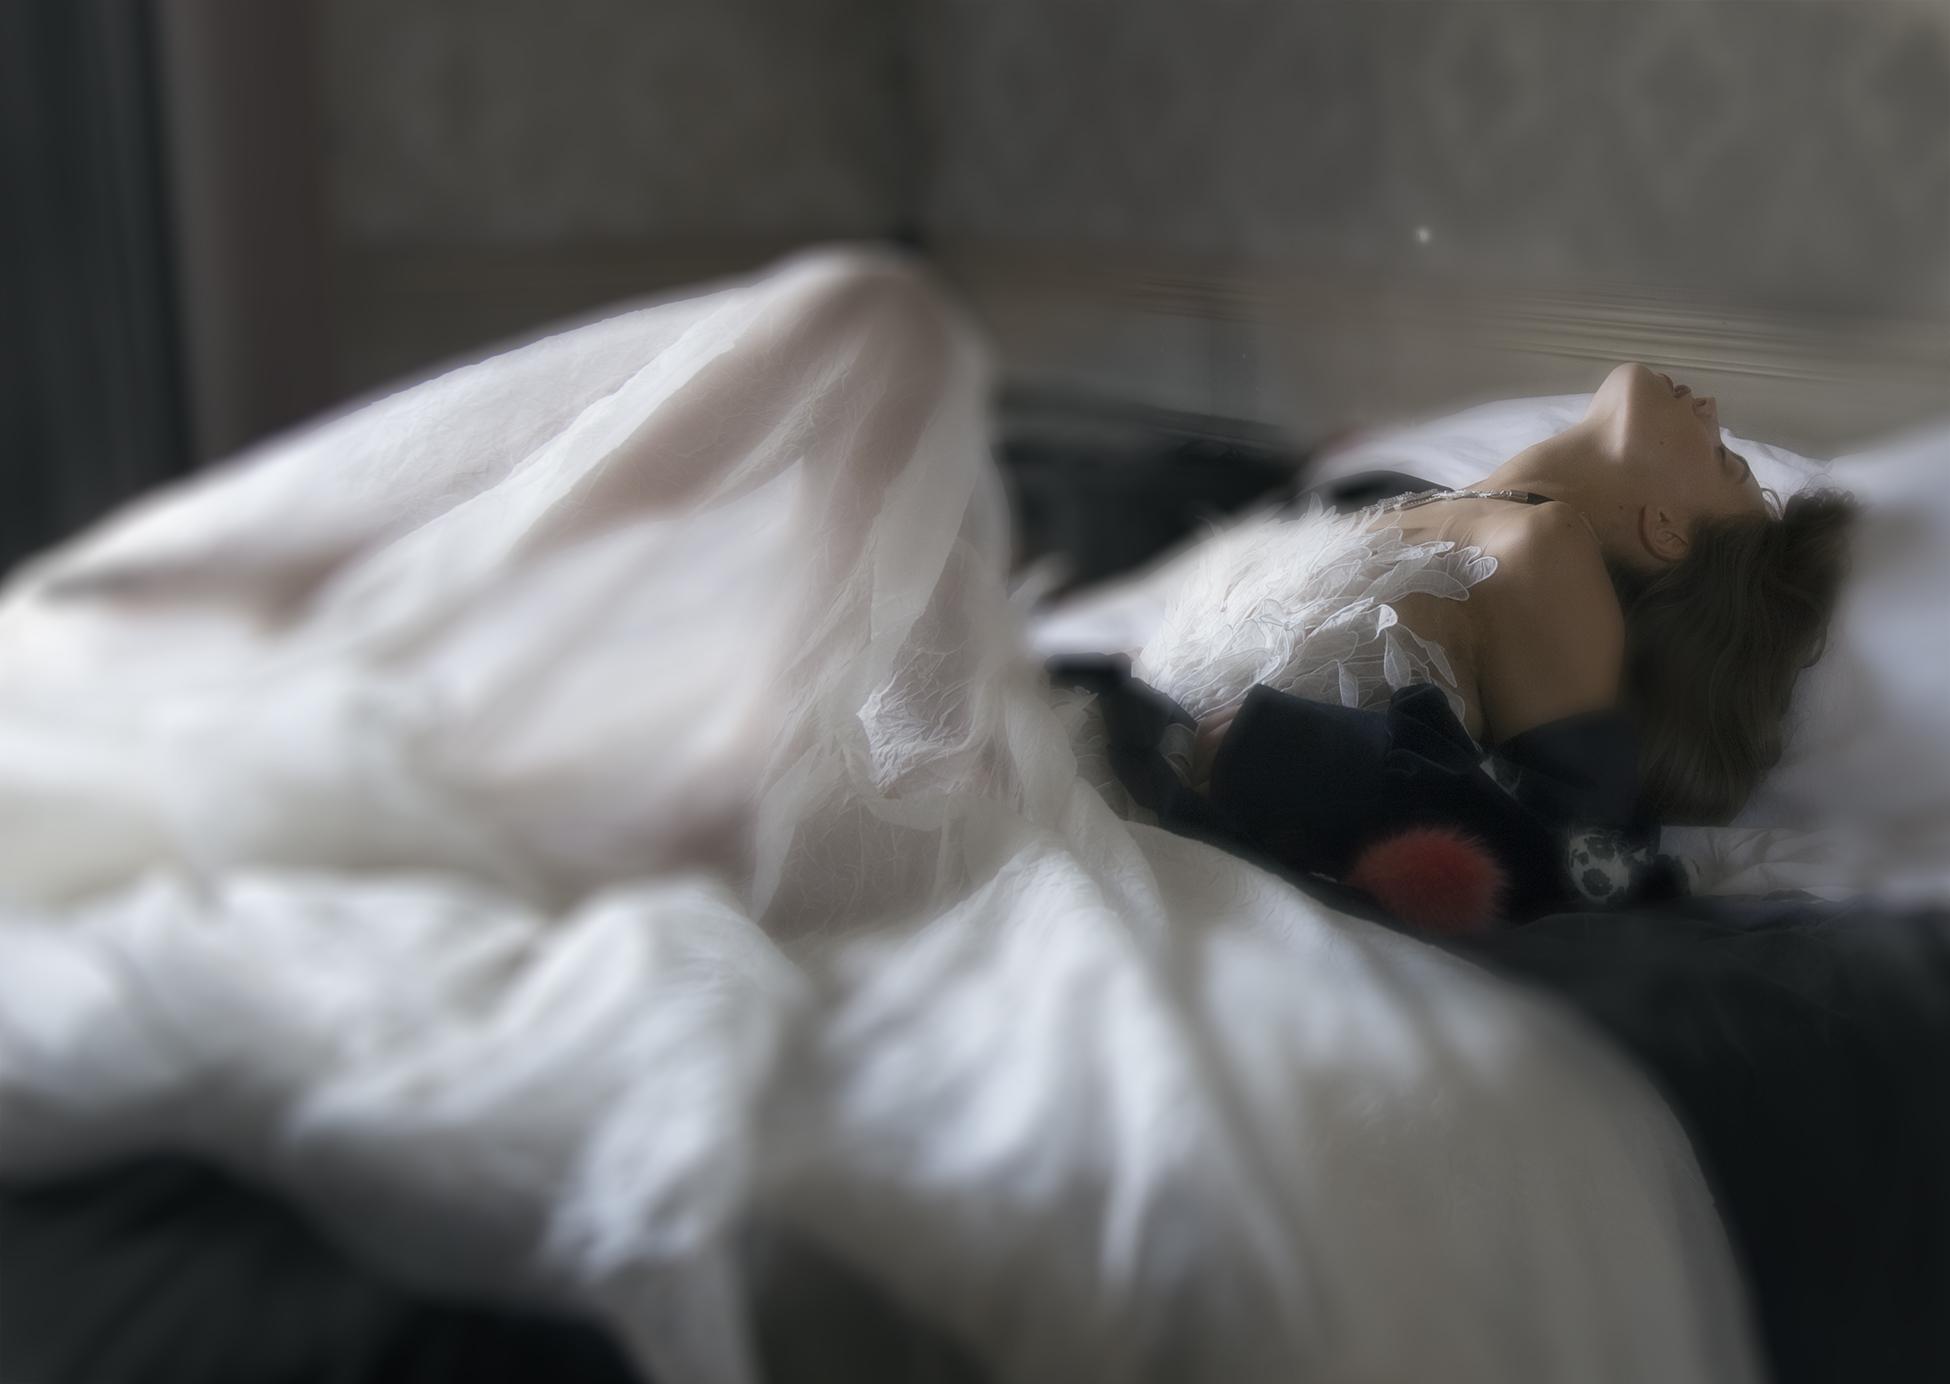 Robe couture : YANINA Veste ISTITUTO MARANGONI avec les pandas «Bar Mashiah pour Istituto Marangoni» Porte clé; KARL LAGERFELD Collier : PAULE KA